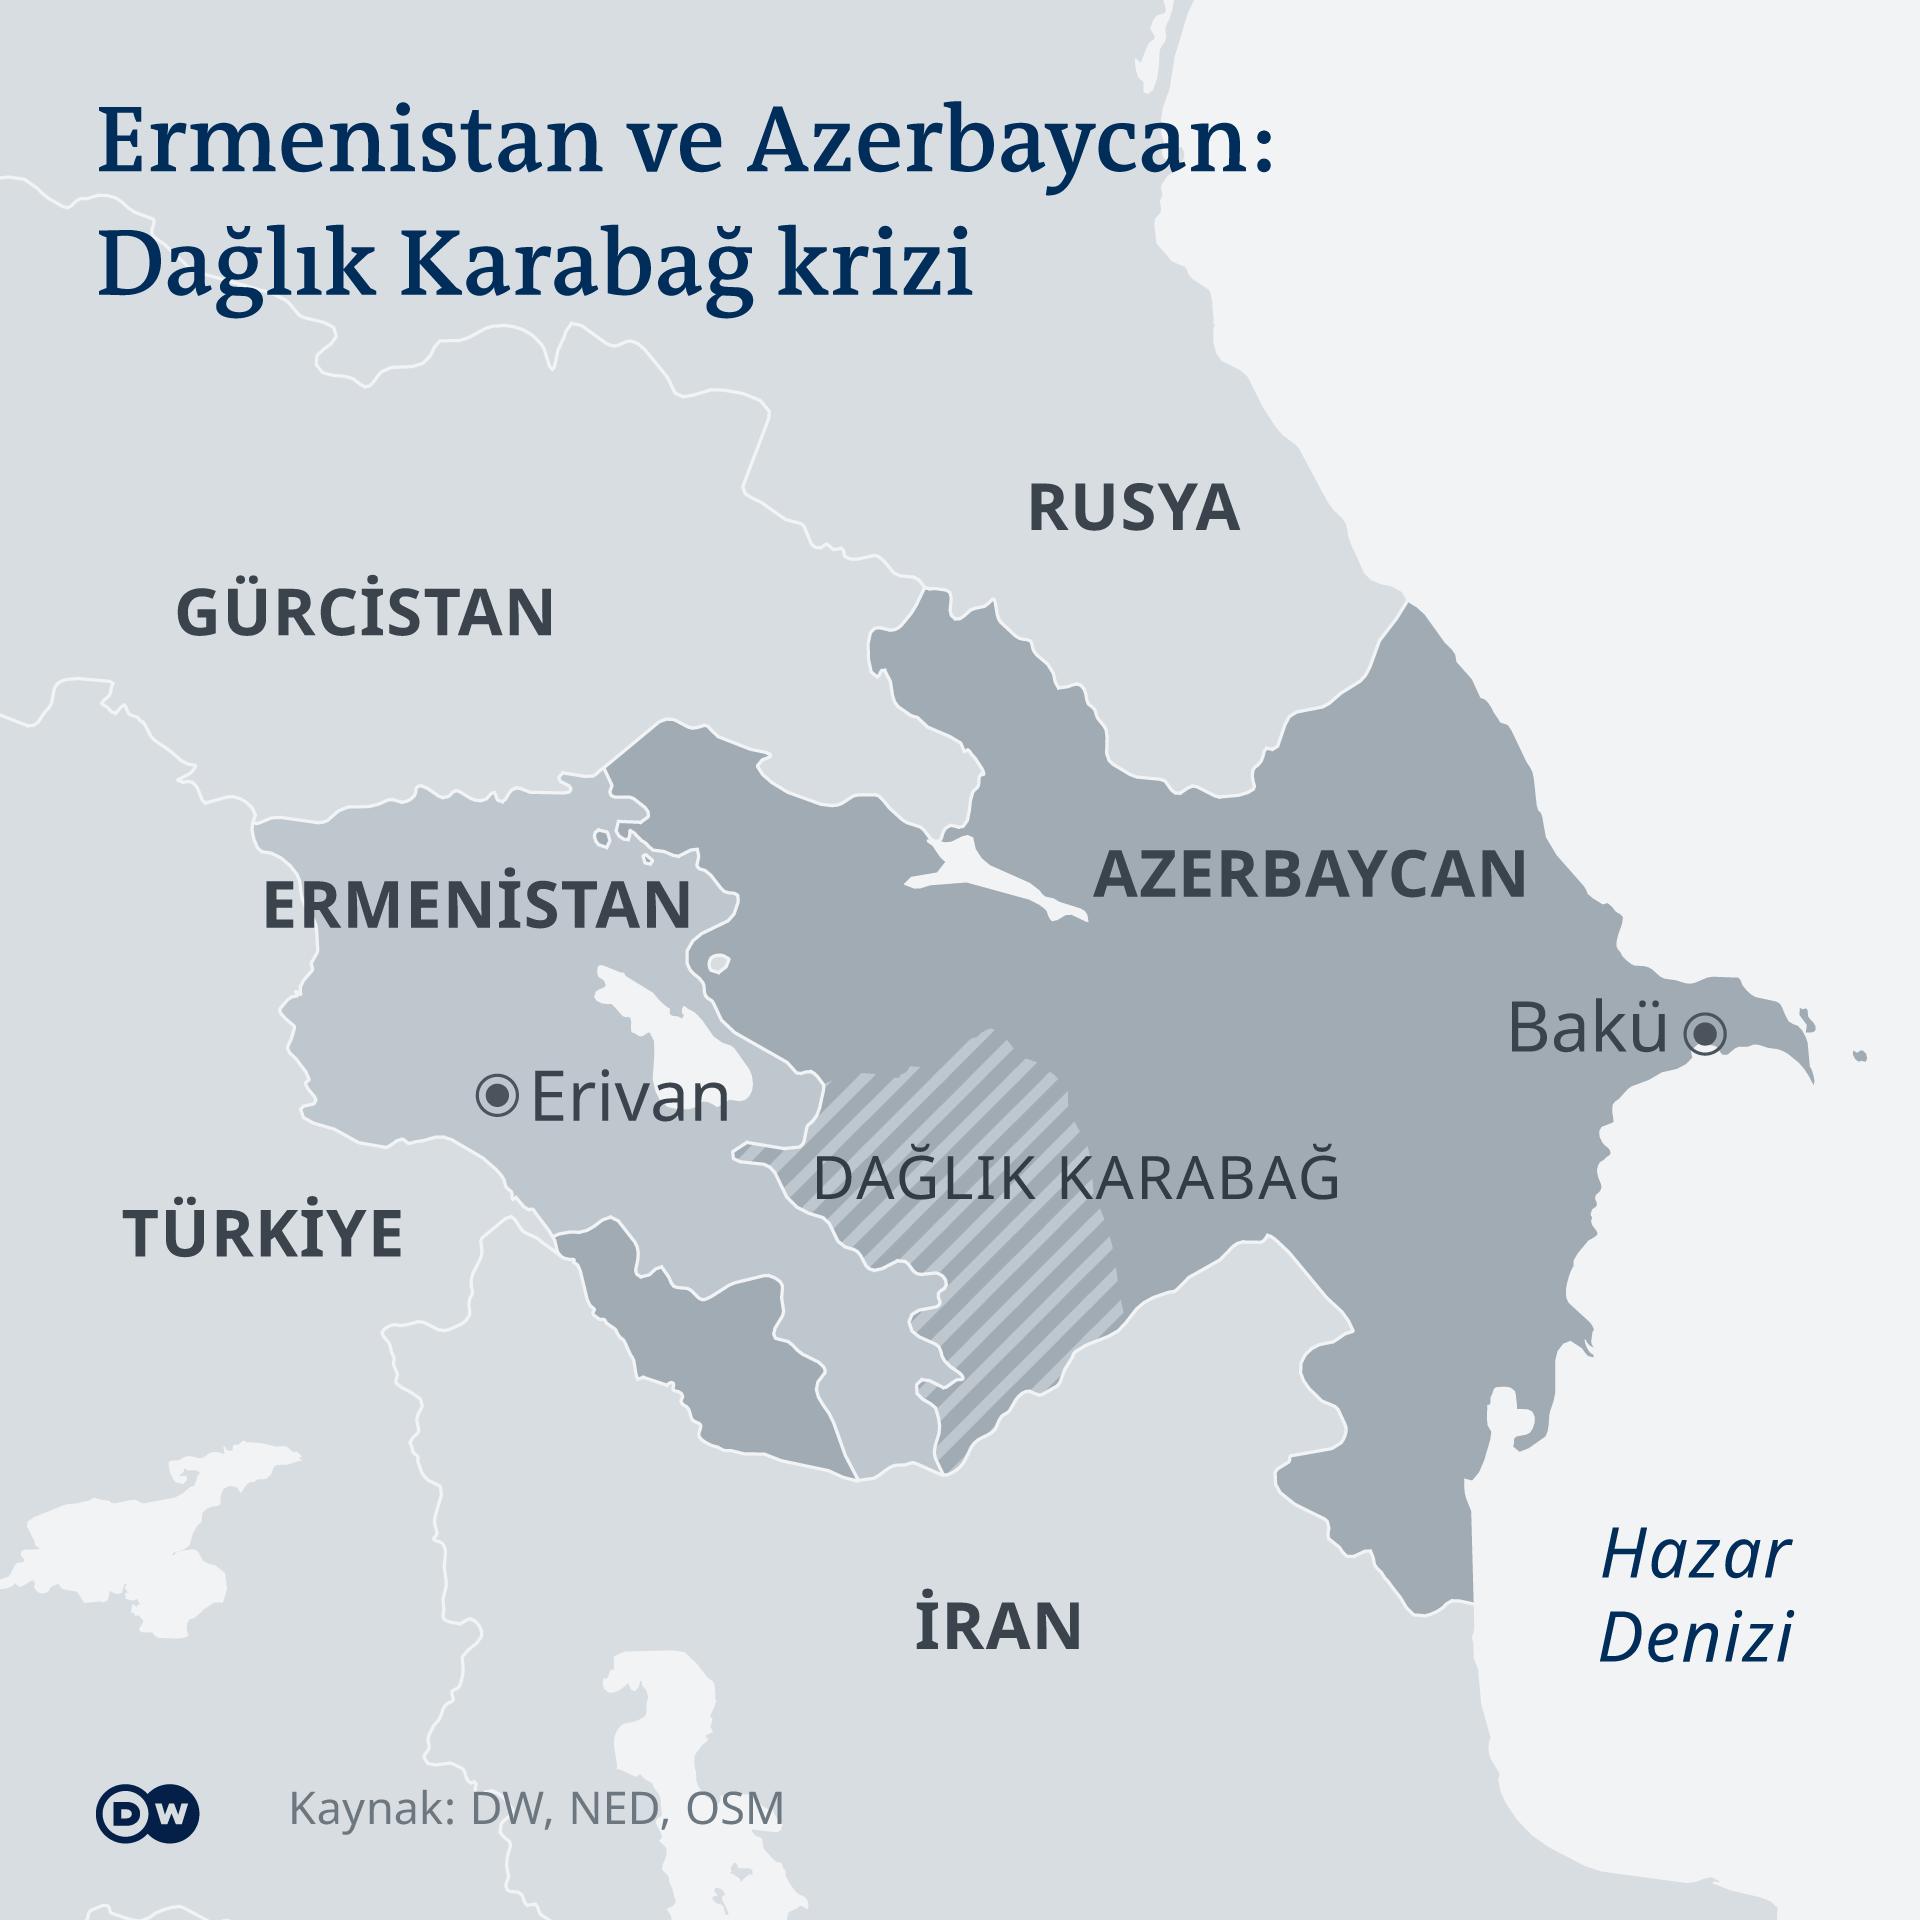 Karte Armenien Aserbaidschan Berg-Karabach TR